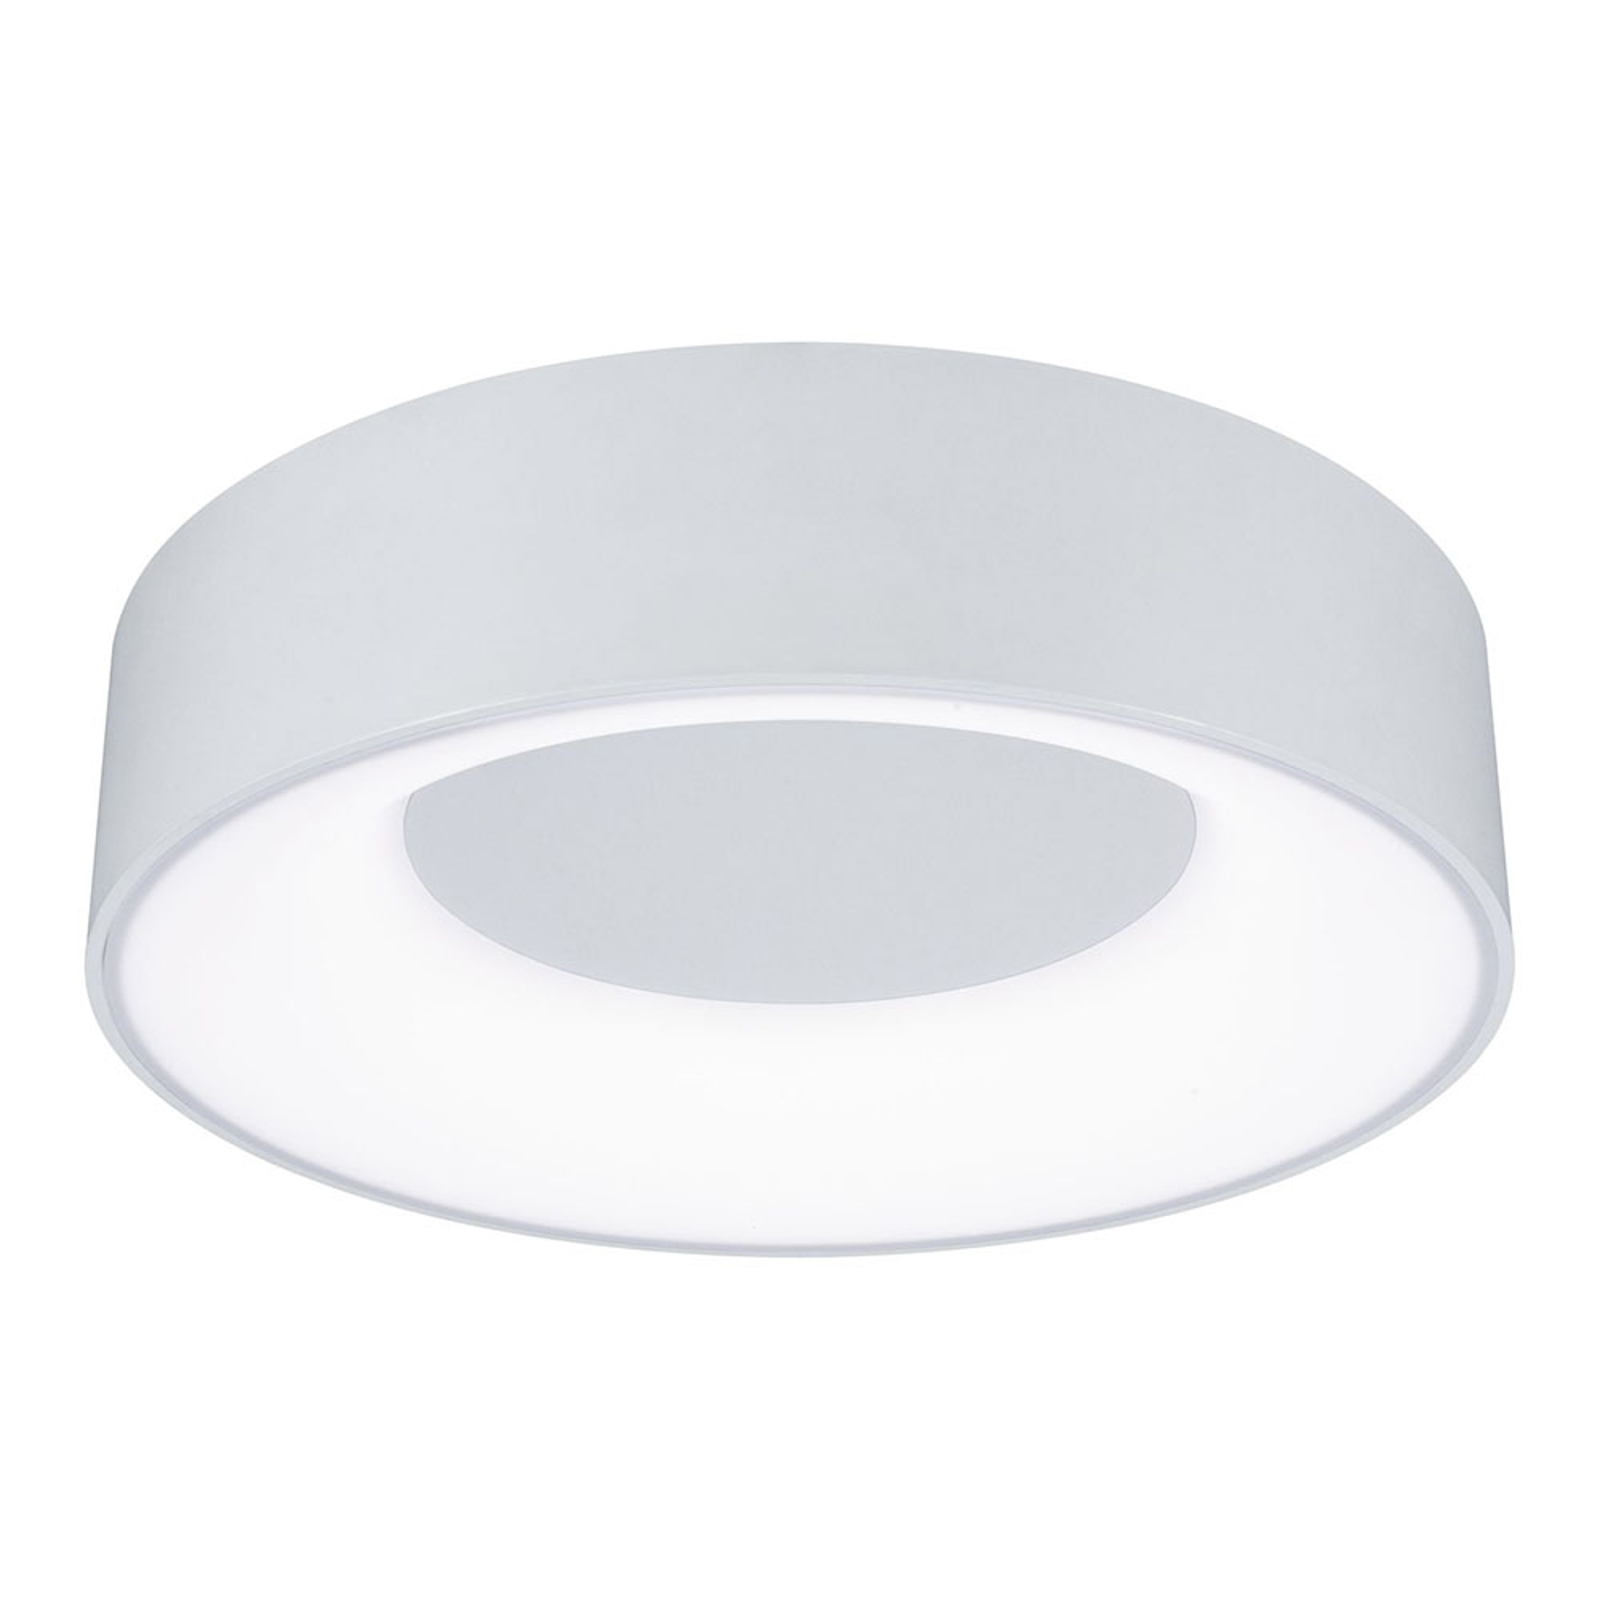 Paulmann HomeSpa Casca LED-Deckenleuchte, Ø 30 cm